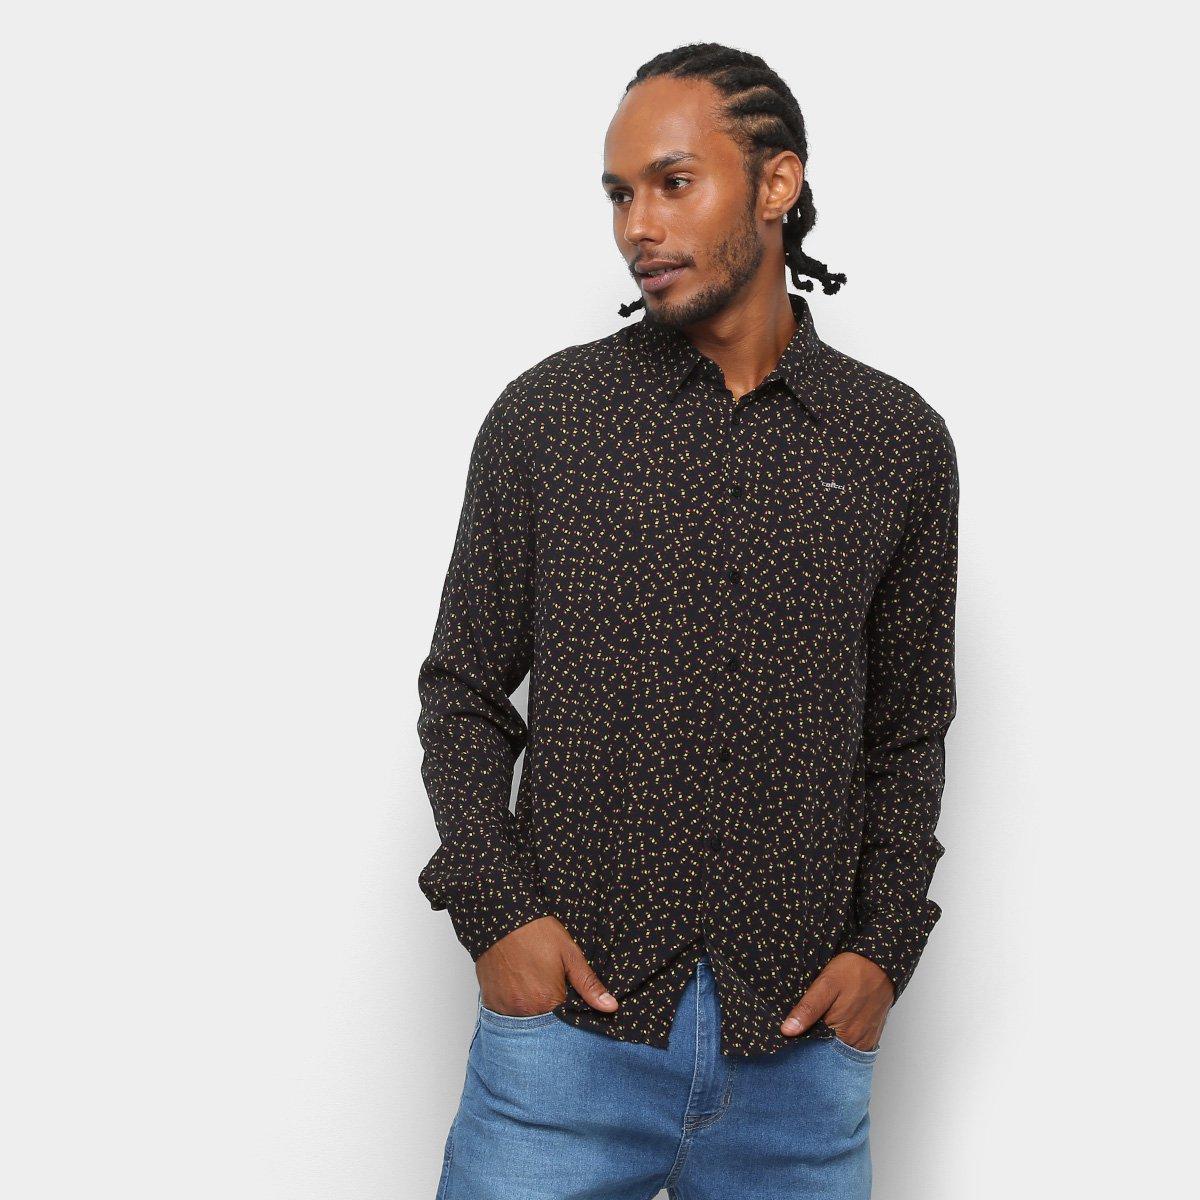 Camisa Colcci Manga Longa Estampada Slim Masculina - Marrom e Laranja -  Compre Agora  cce39fcc0a2